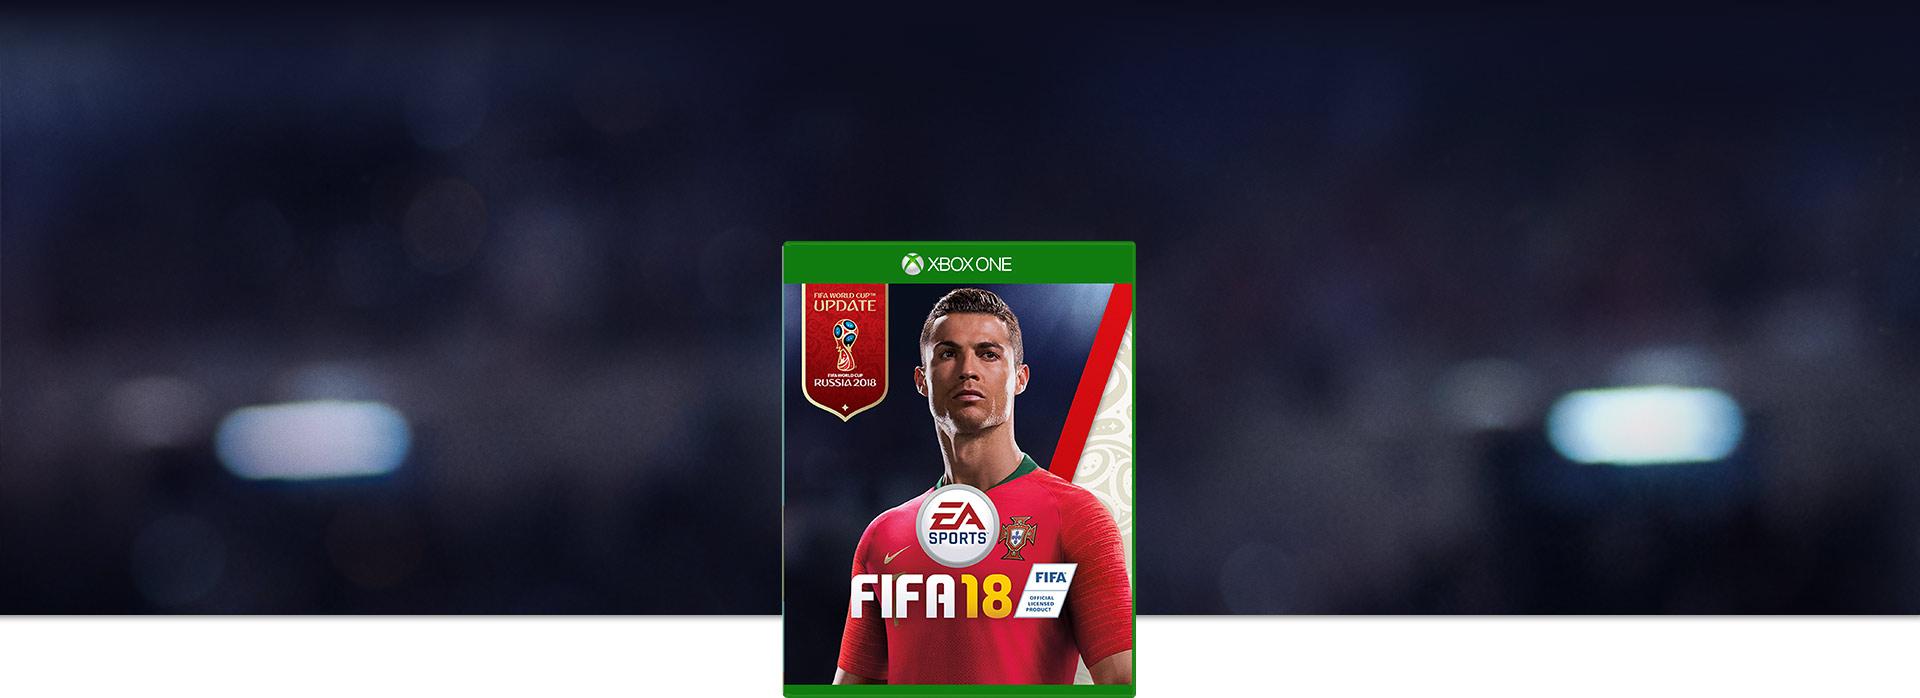 FIFA 18 包裝圖,葡萄牙 Ronaldo 的世界盃套件